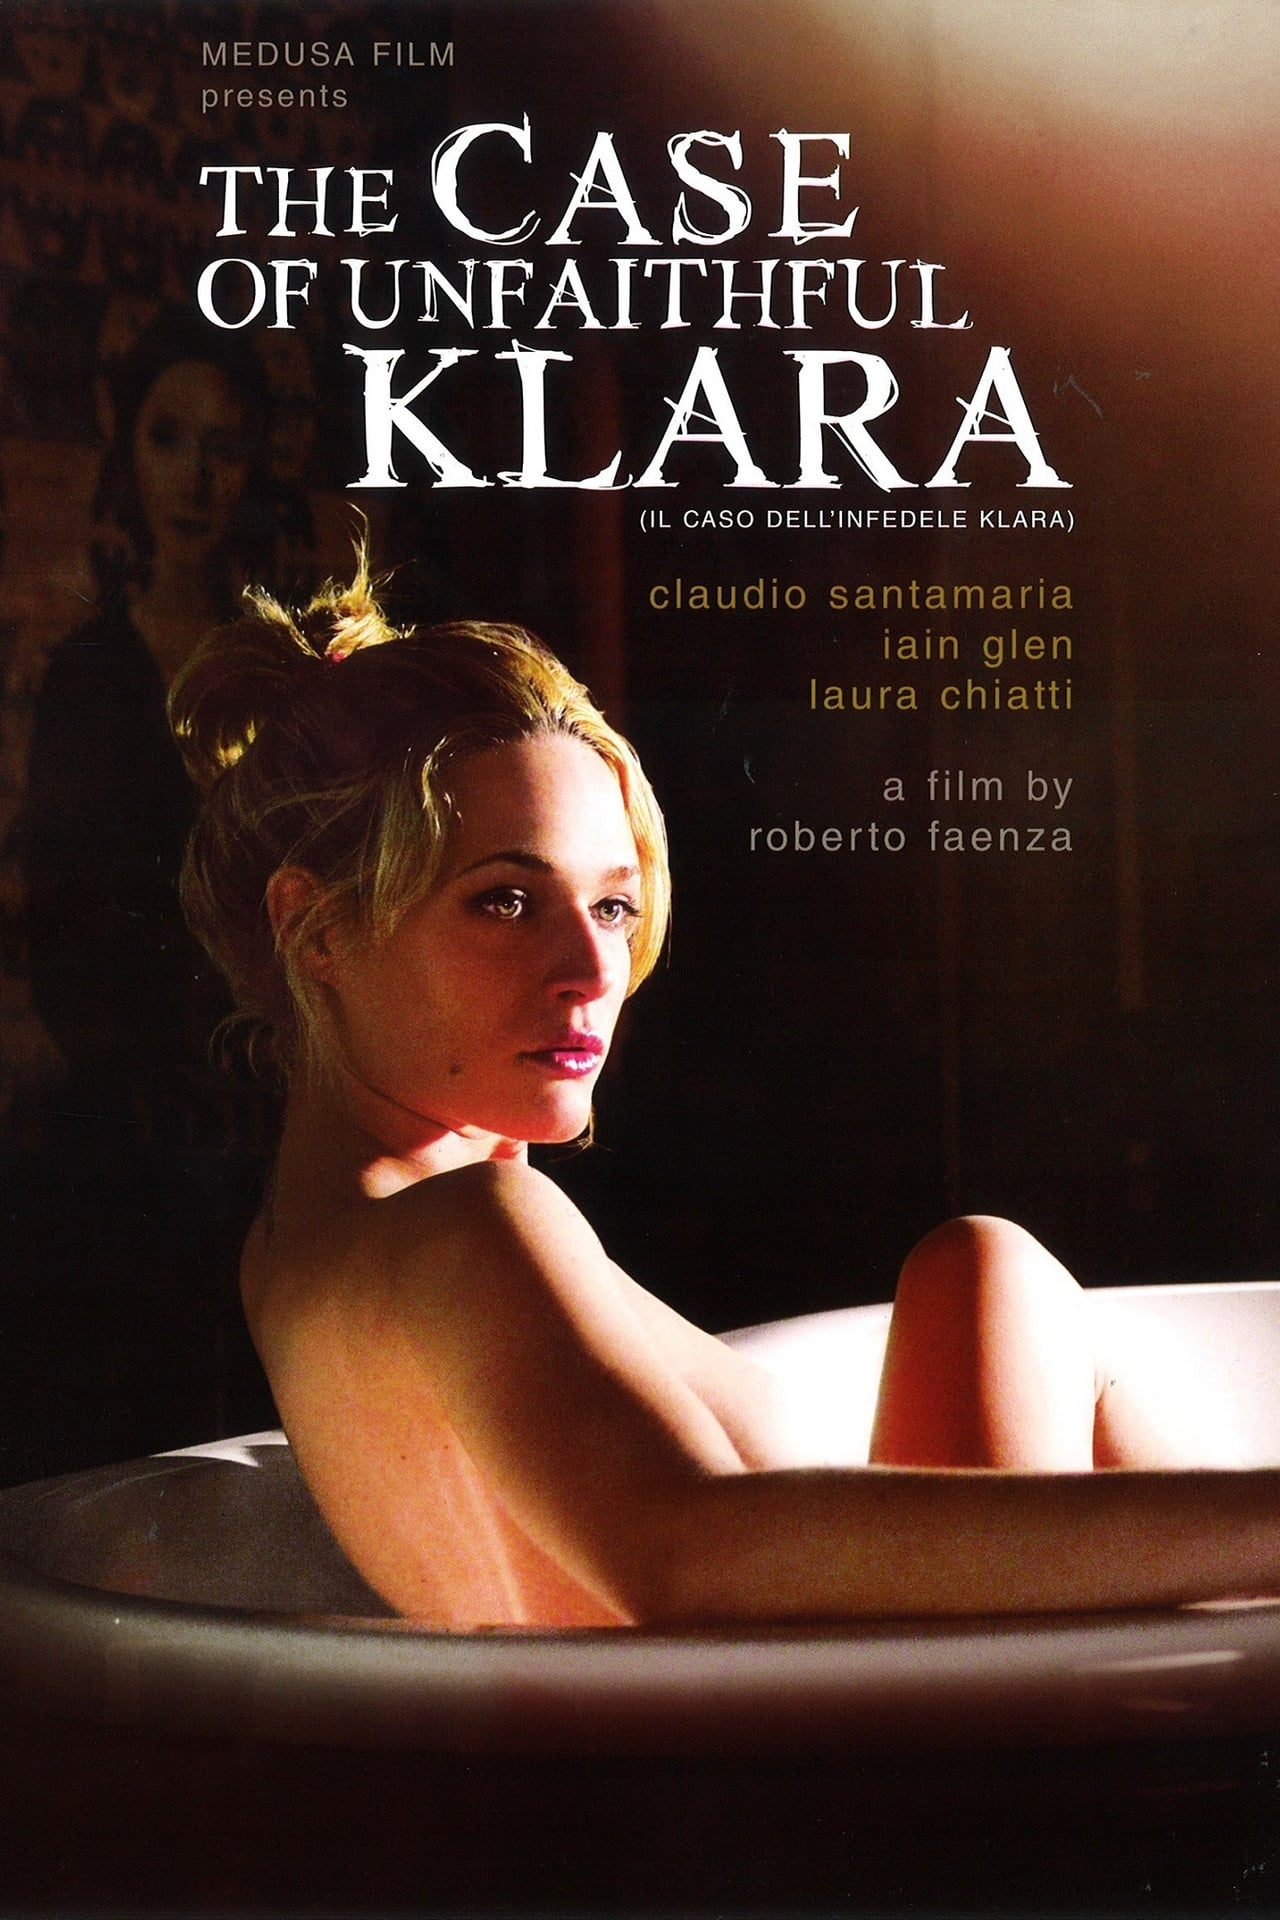 The Case of Unfaithful Klara